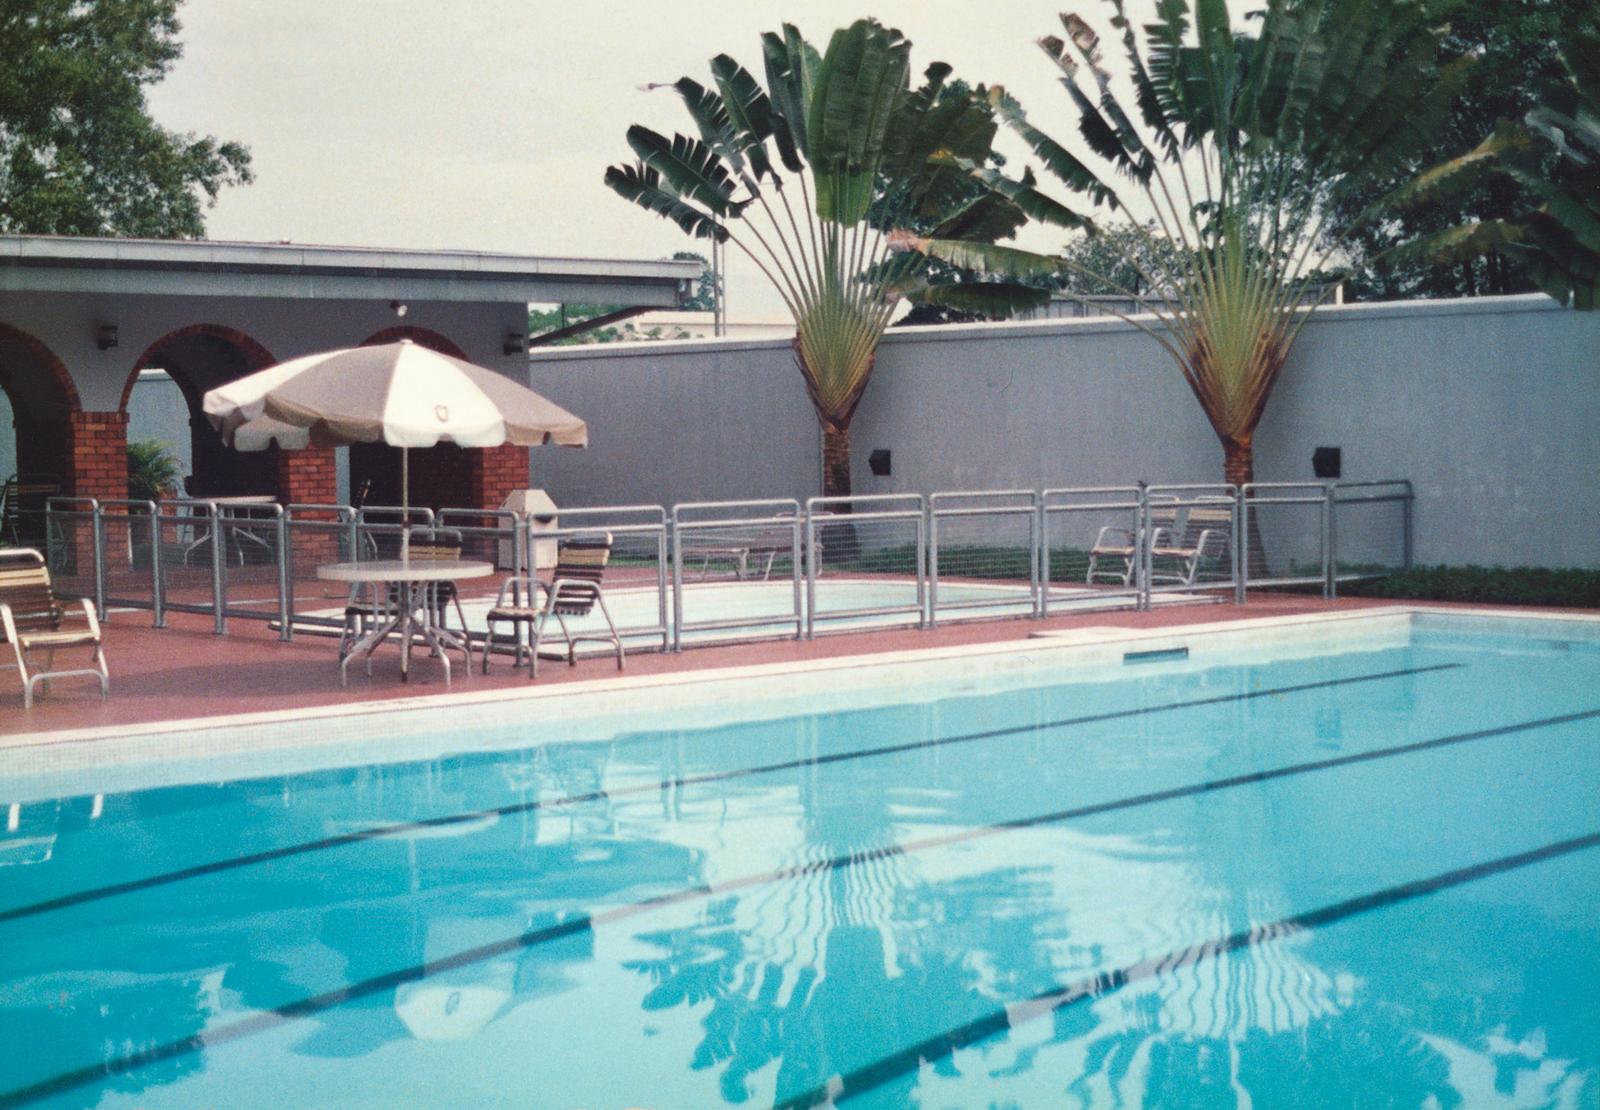 Kuala Lumpur - Recreation/Community Center/Gym/Theater - 1988